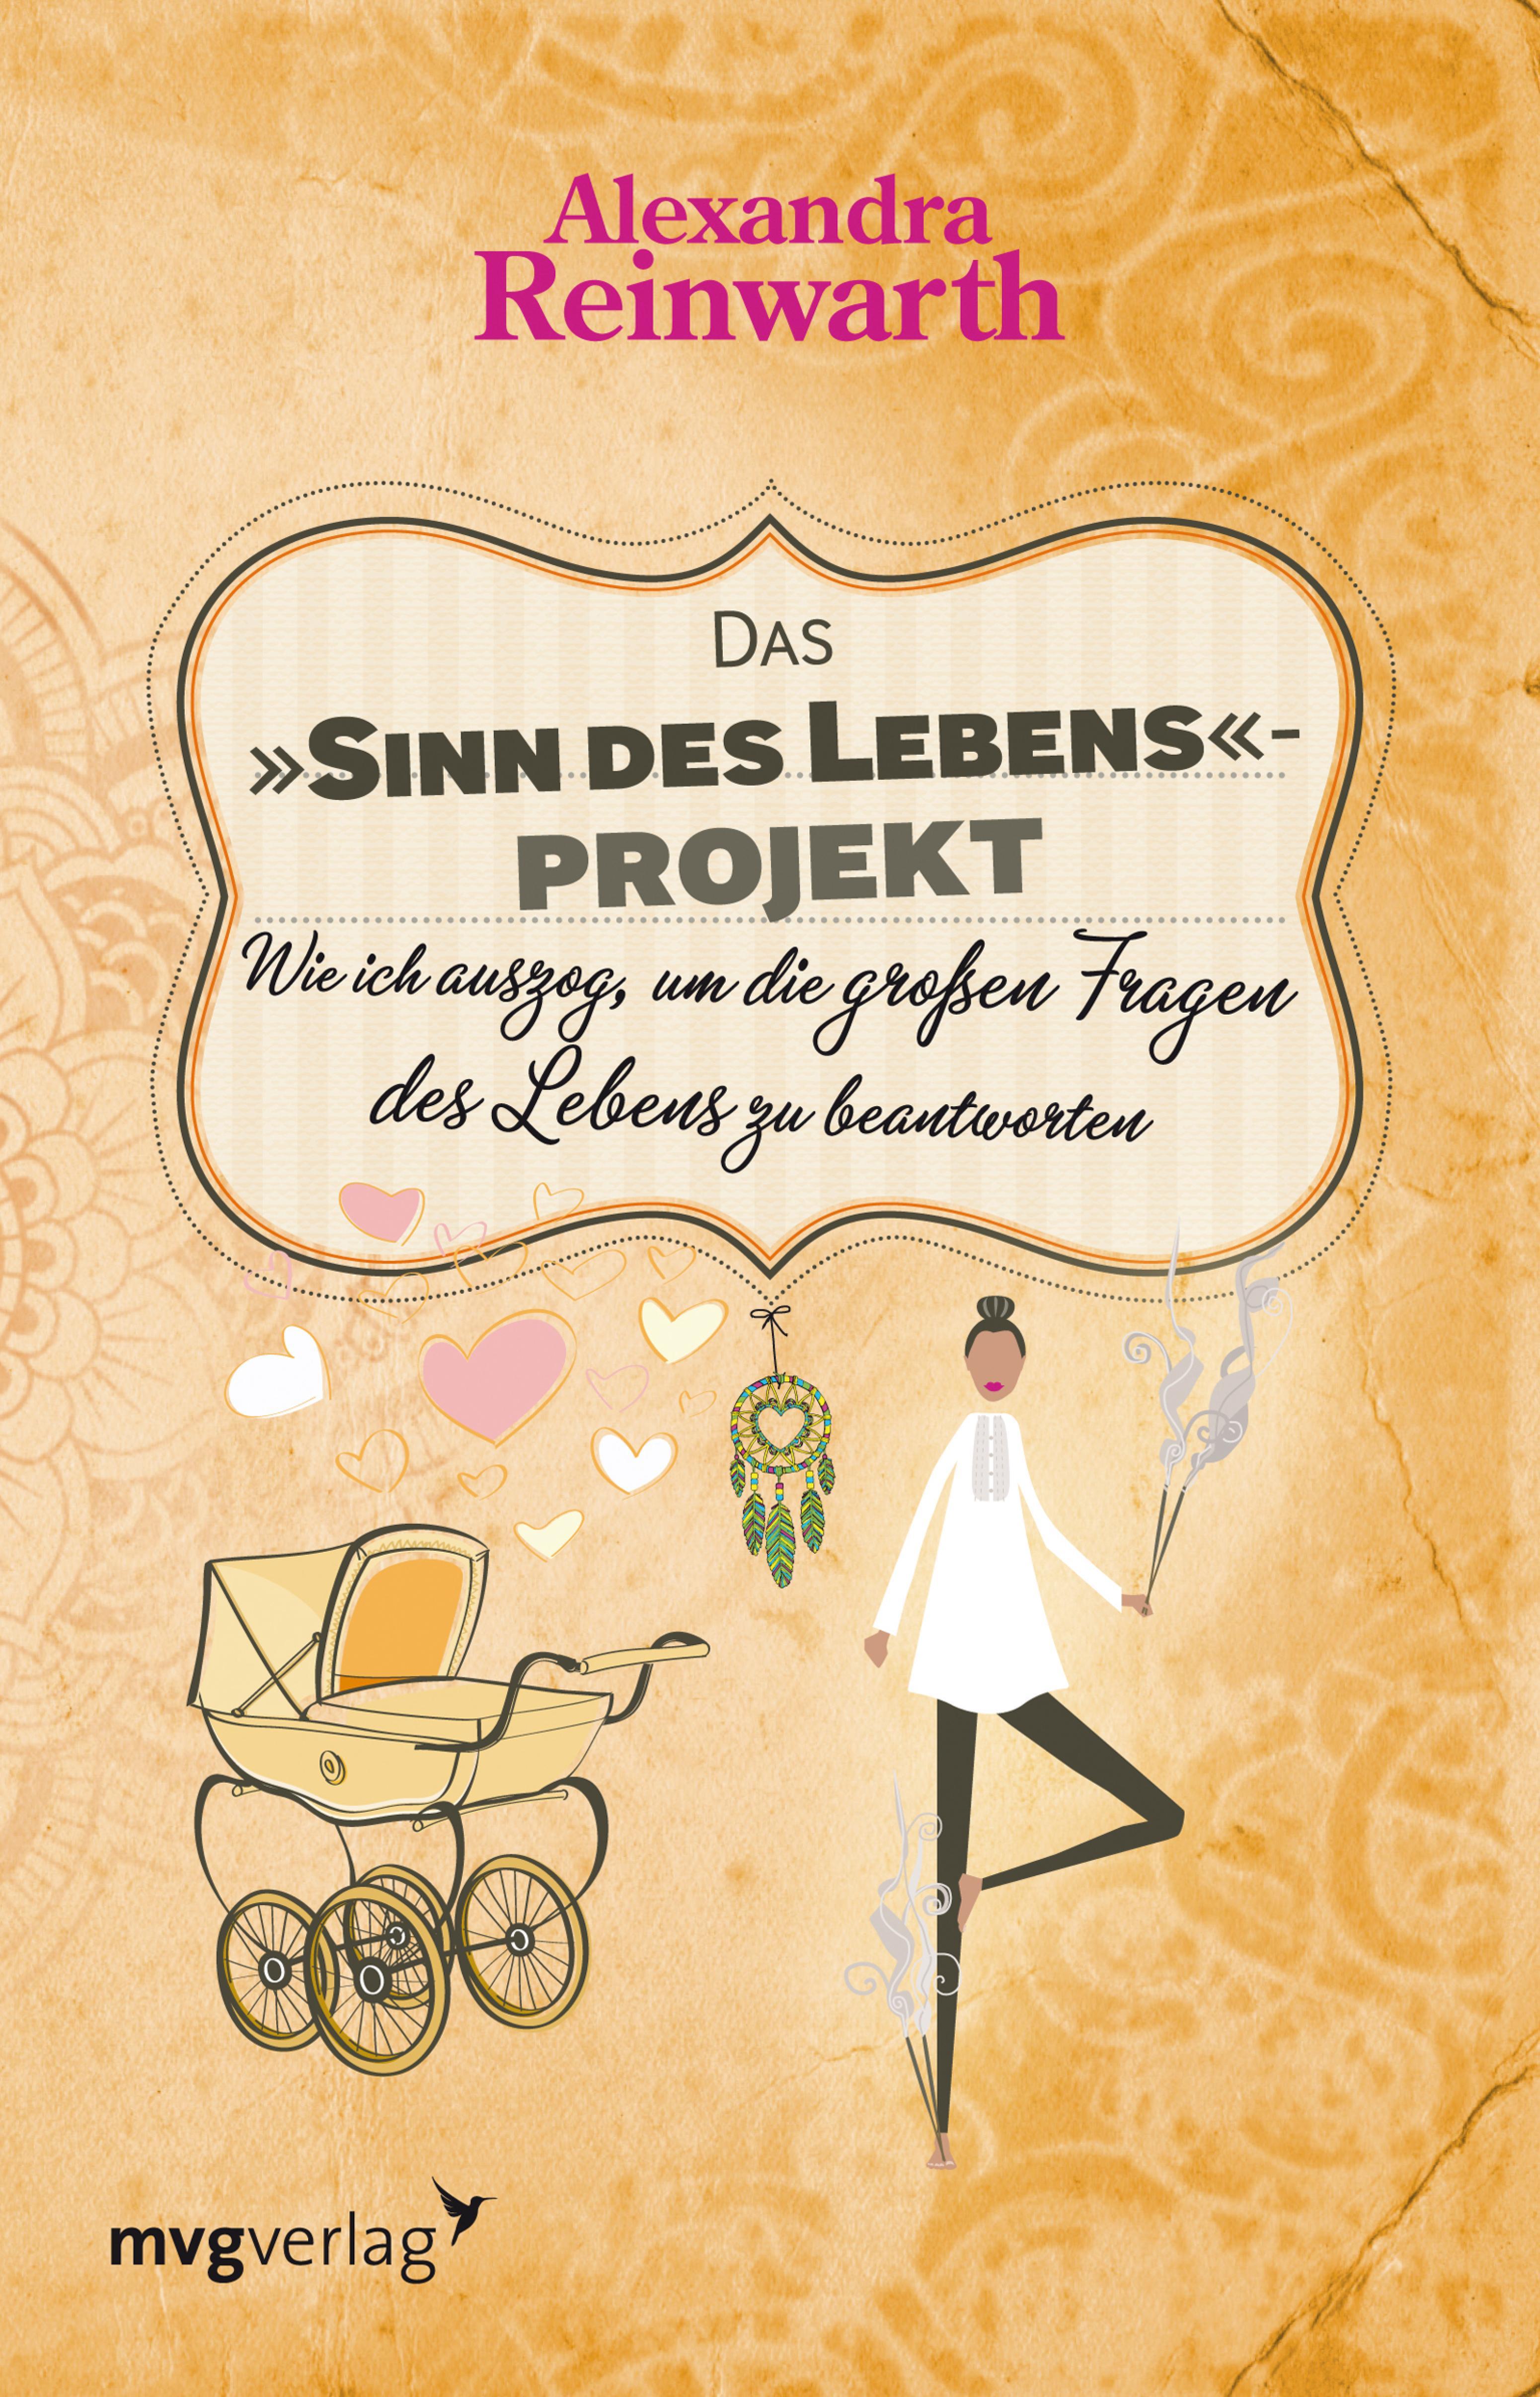 Das Sinn des Lebens-Projekt (Alexandra Reinwarth - mvg